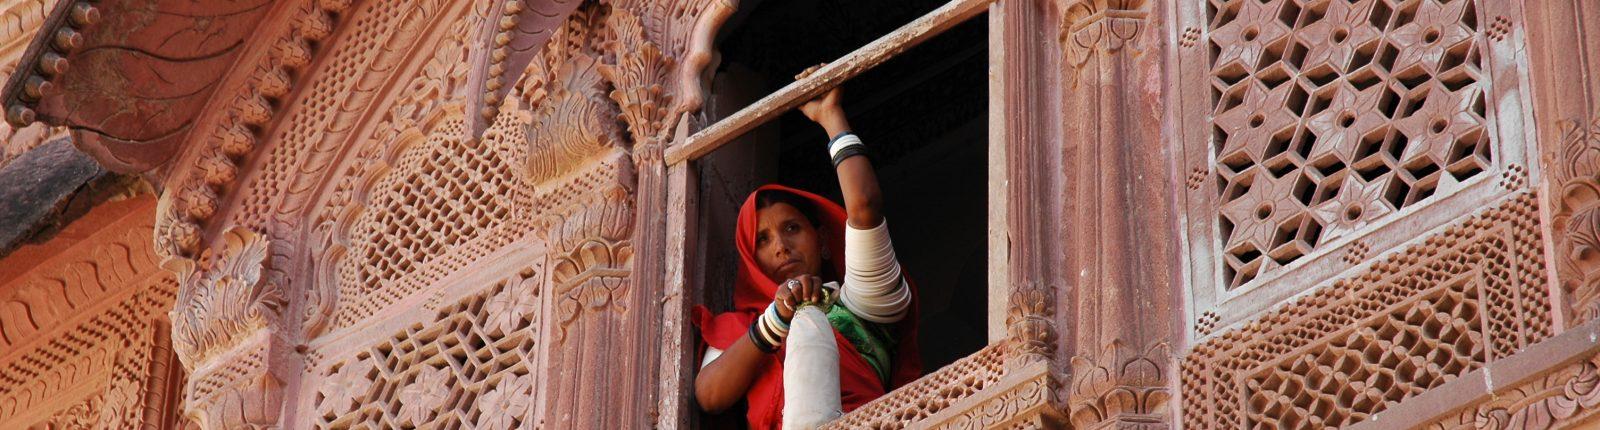 Inde (Rajasthan)